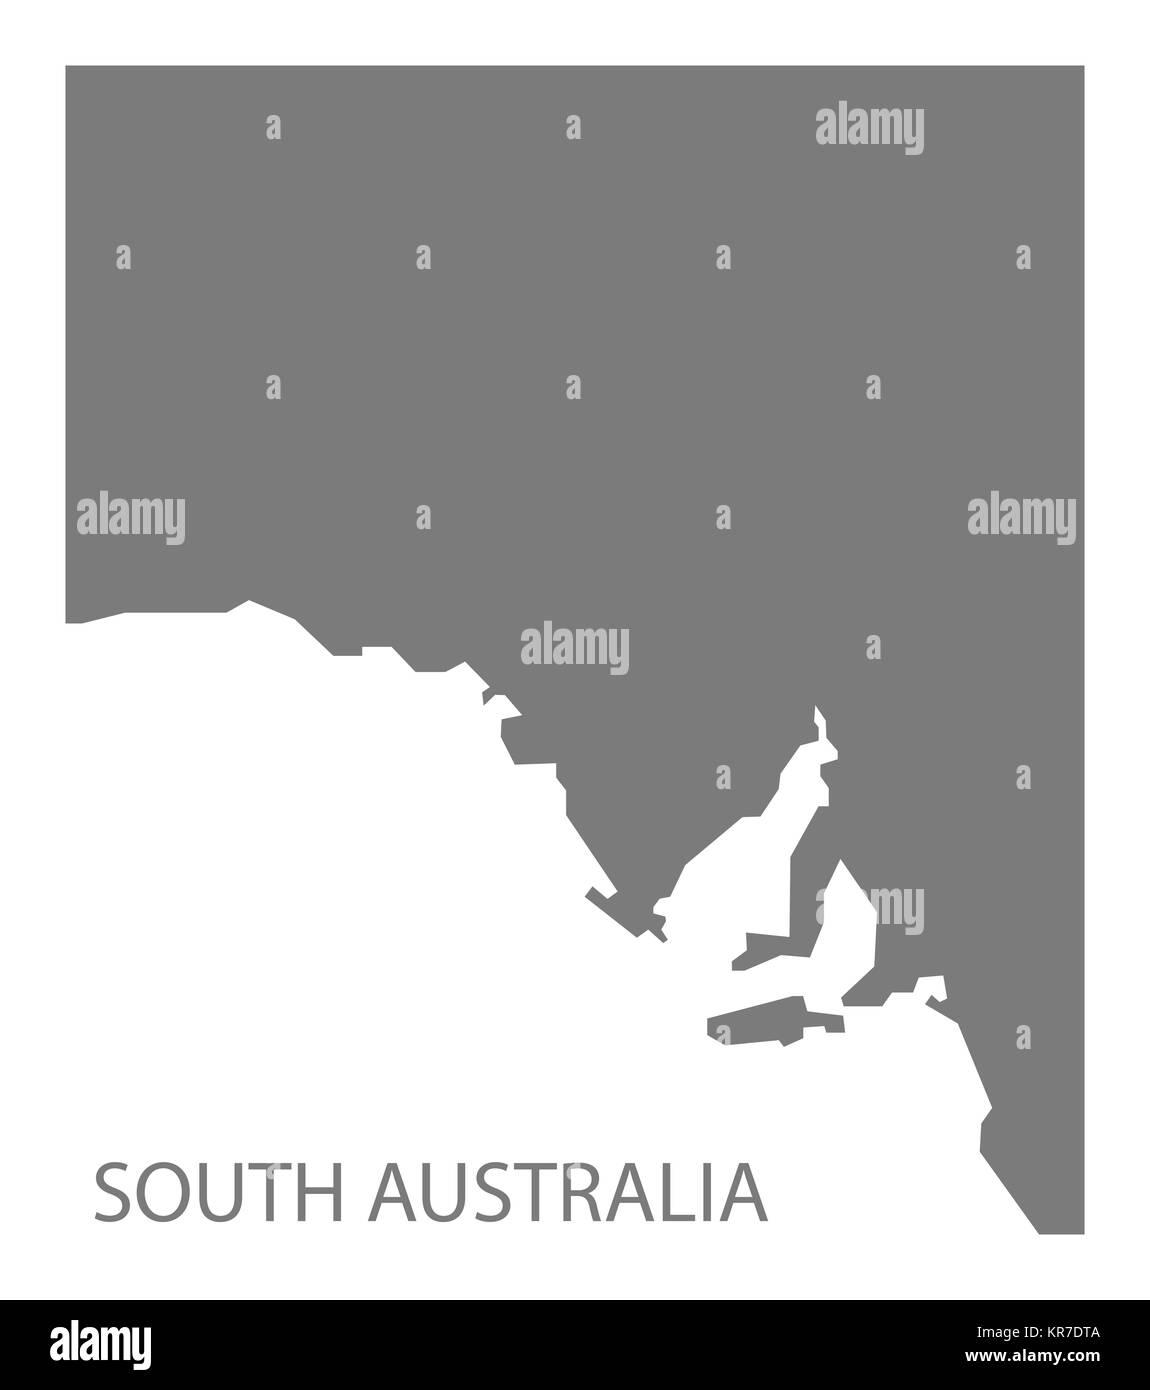 South Australia Map grey - Stock Image